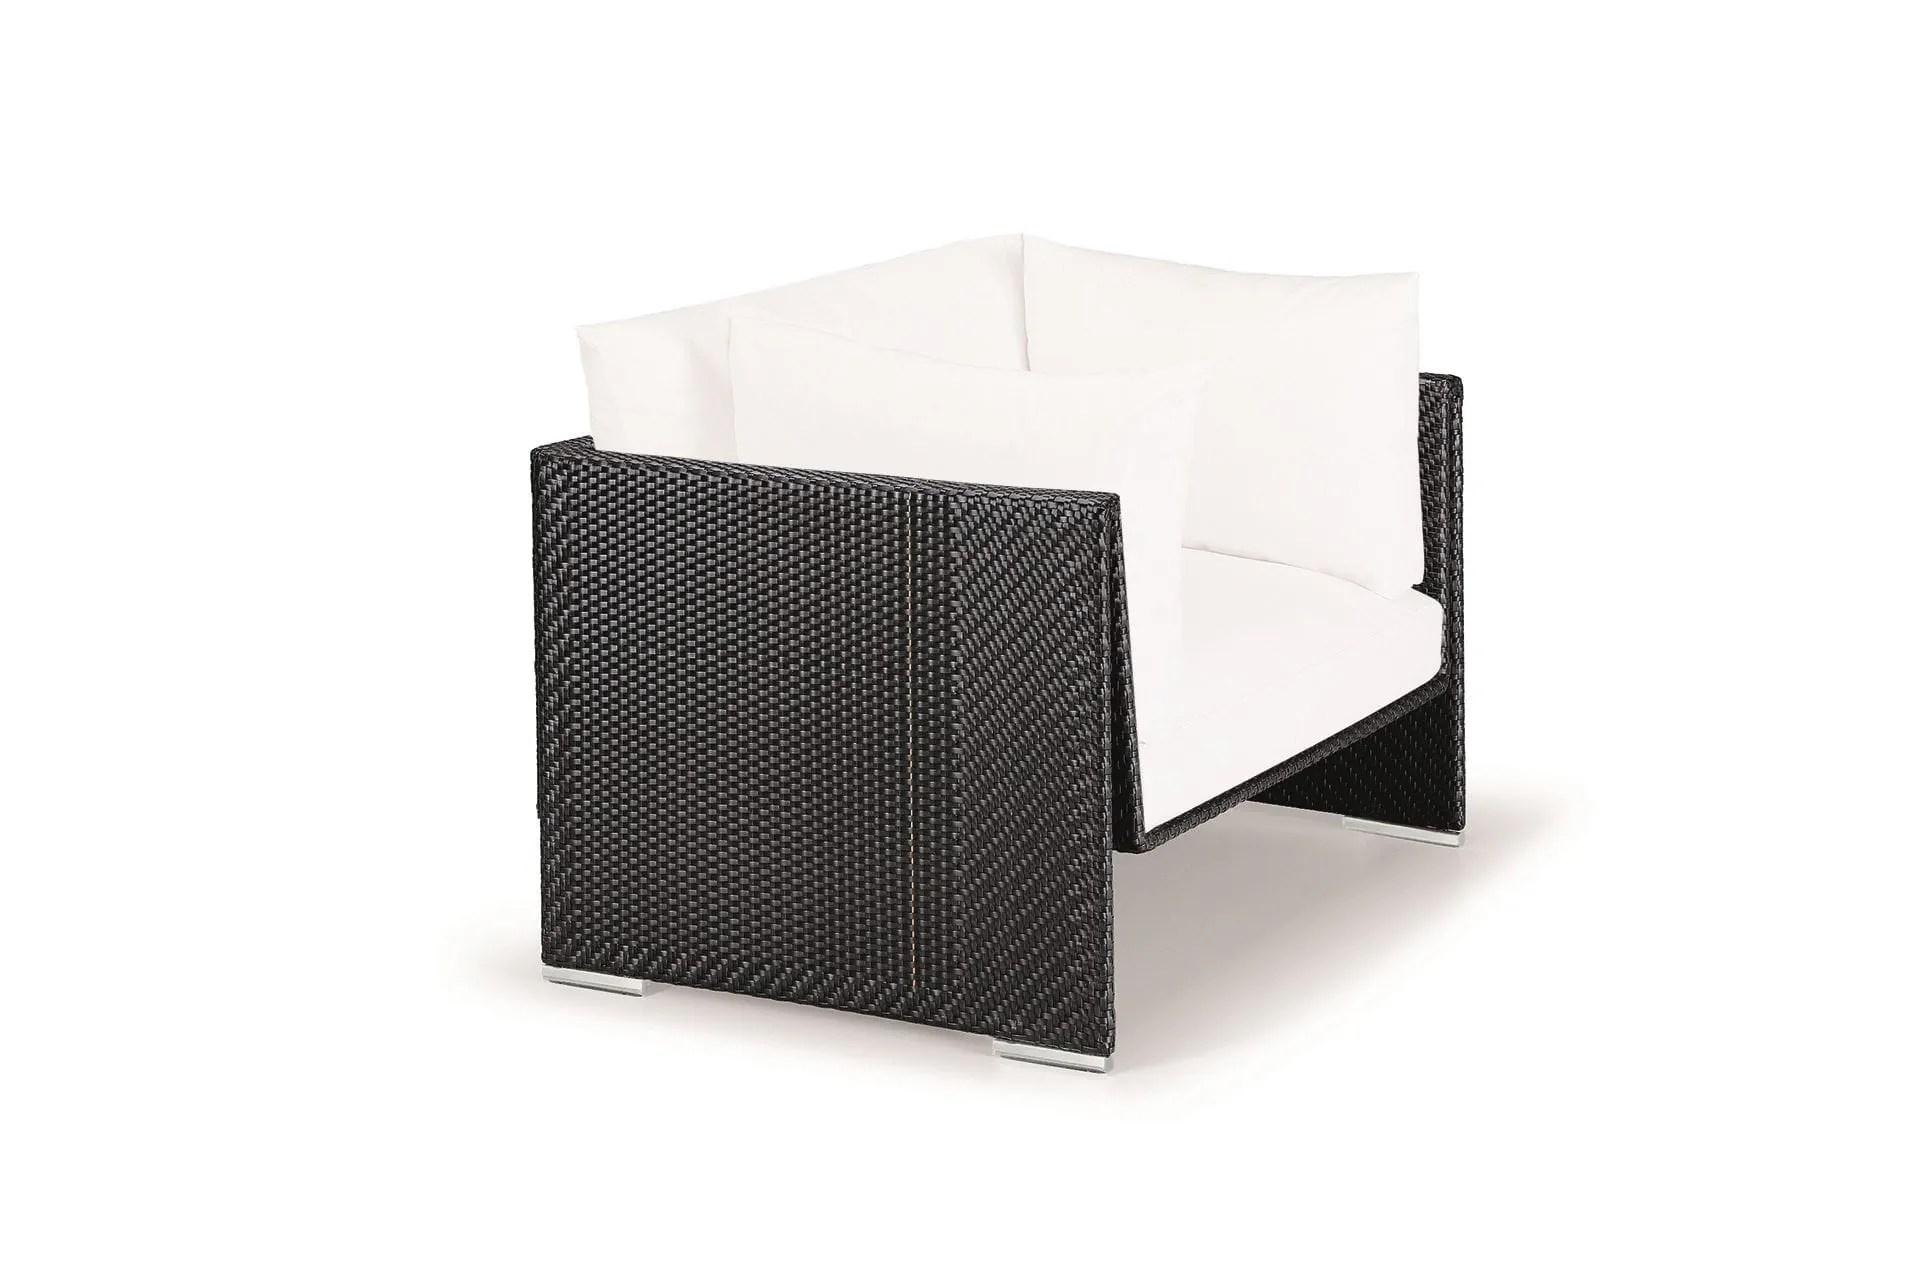 acrylic side chair with cushion wheel for office dedon | slim line lounge